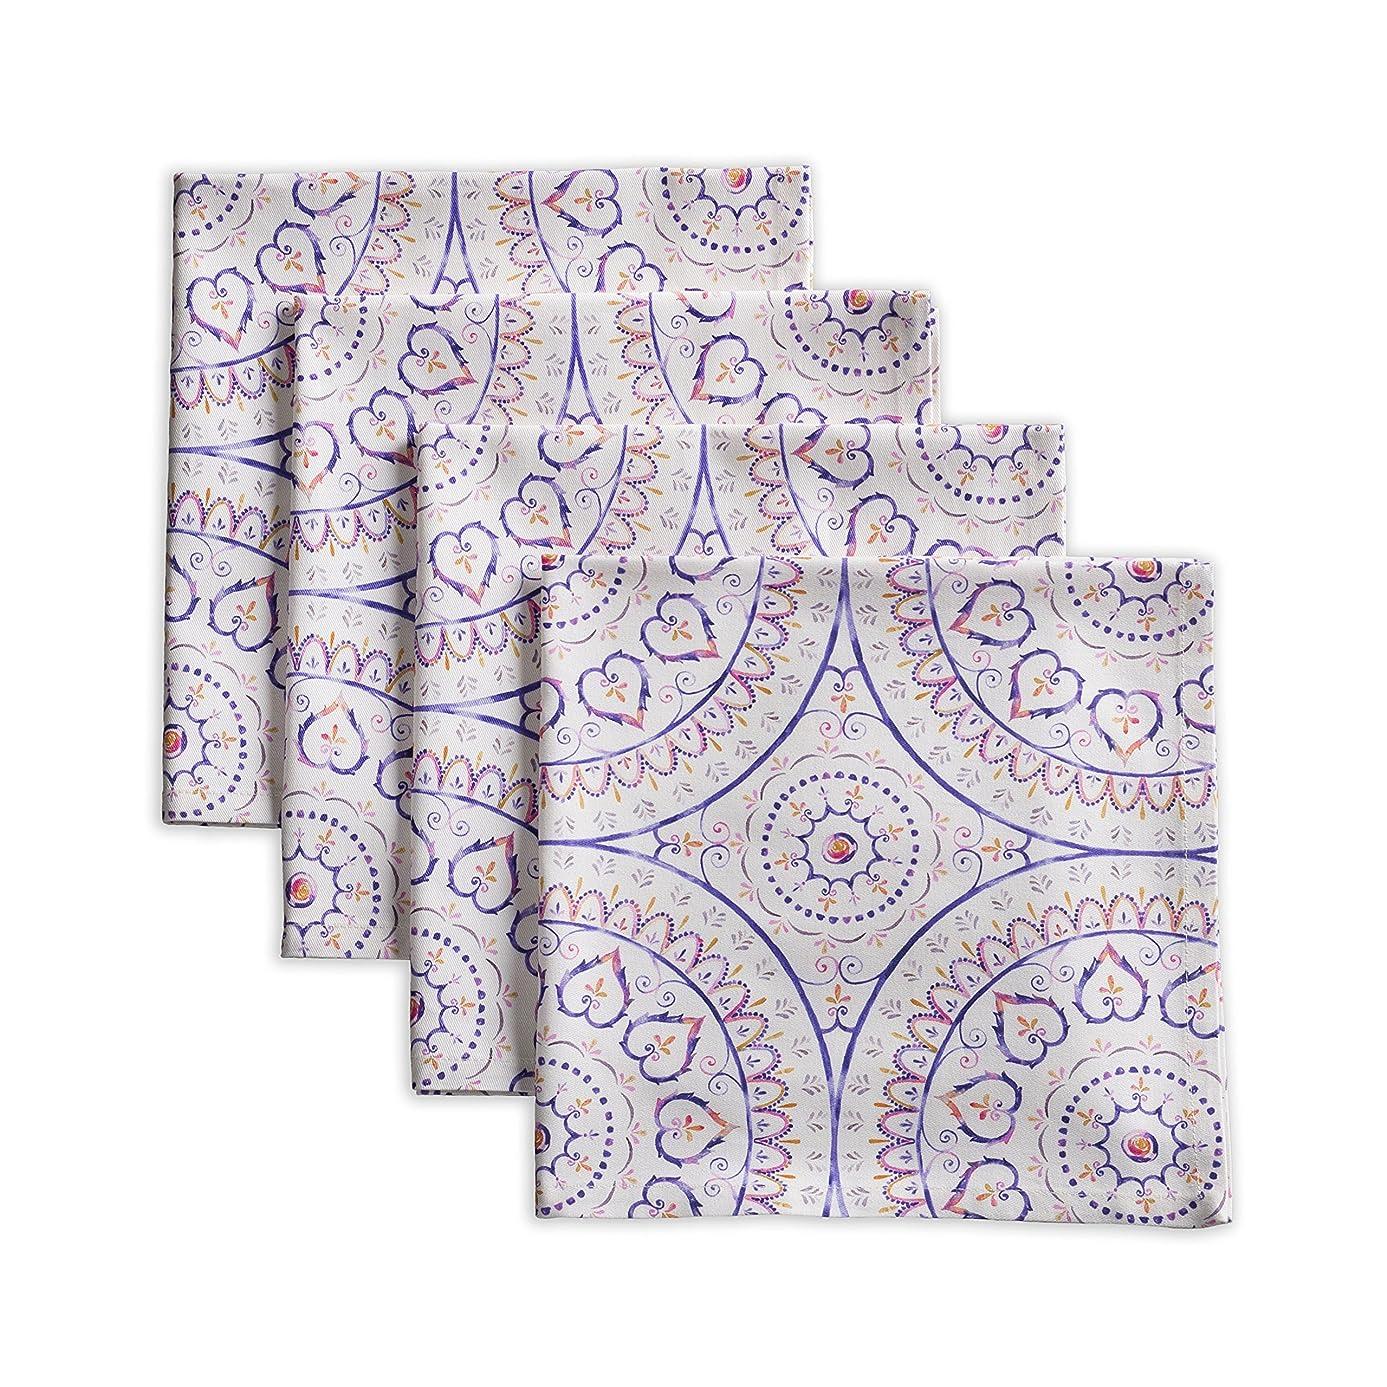 Maison d' Hermine Mandala 100% Cotton Set of 4 Napkins 20 Inch by 20 Inch